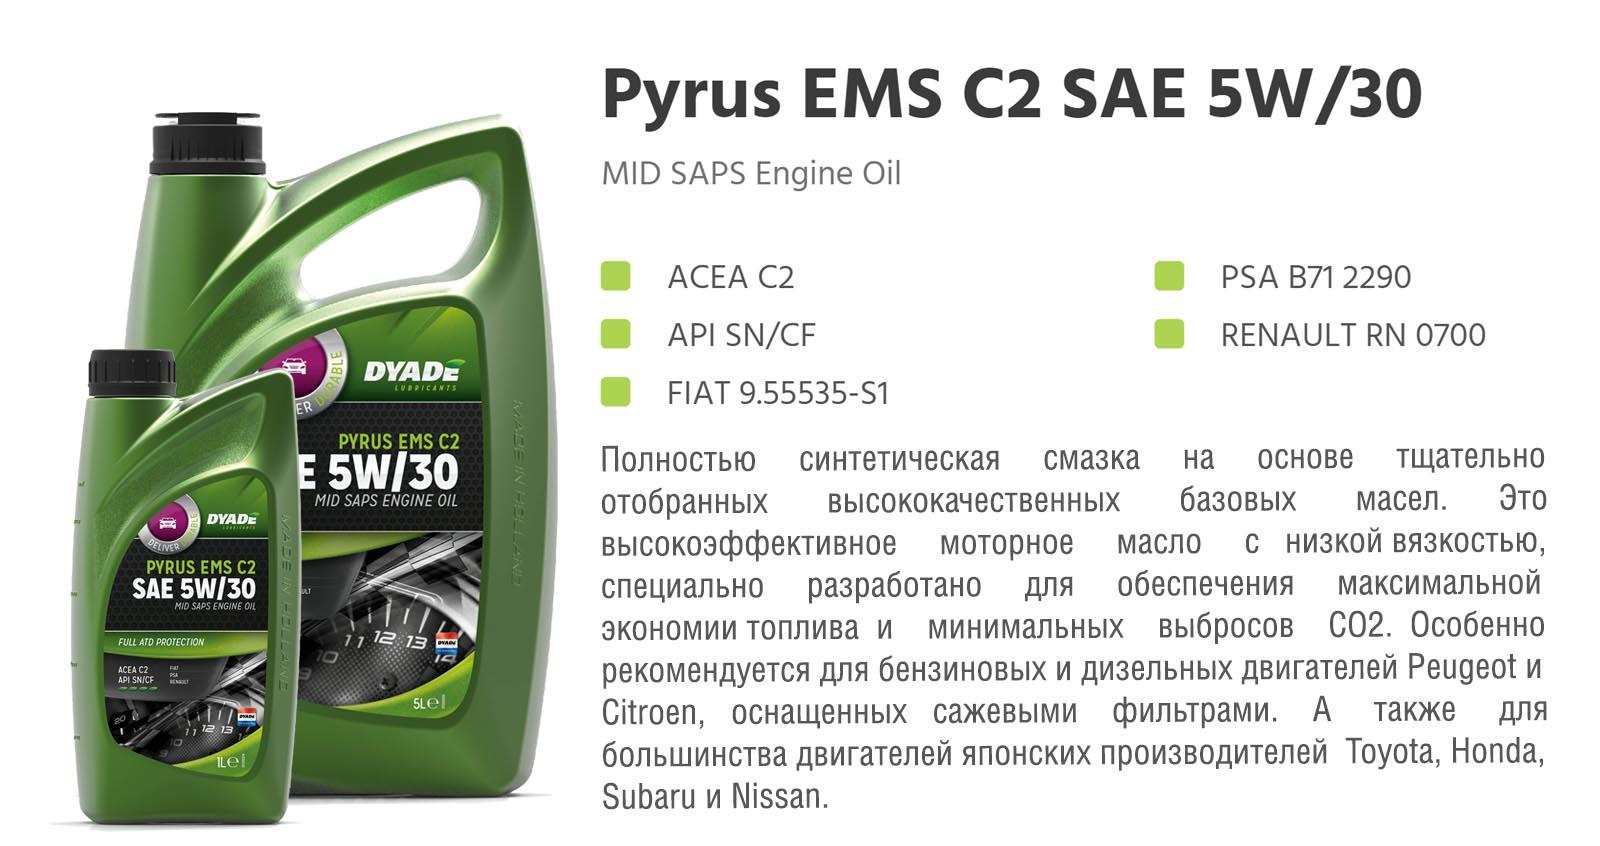 Масло моторное Pyrus EMS C2 SAE 5W30 (1L) 574198 dyadelubricants